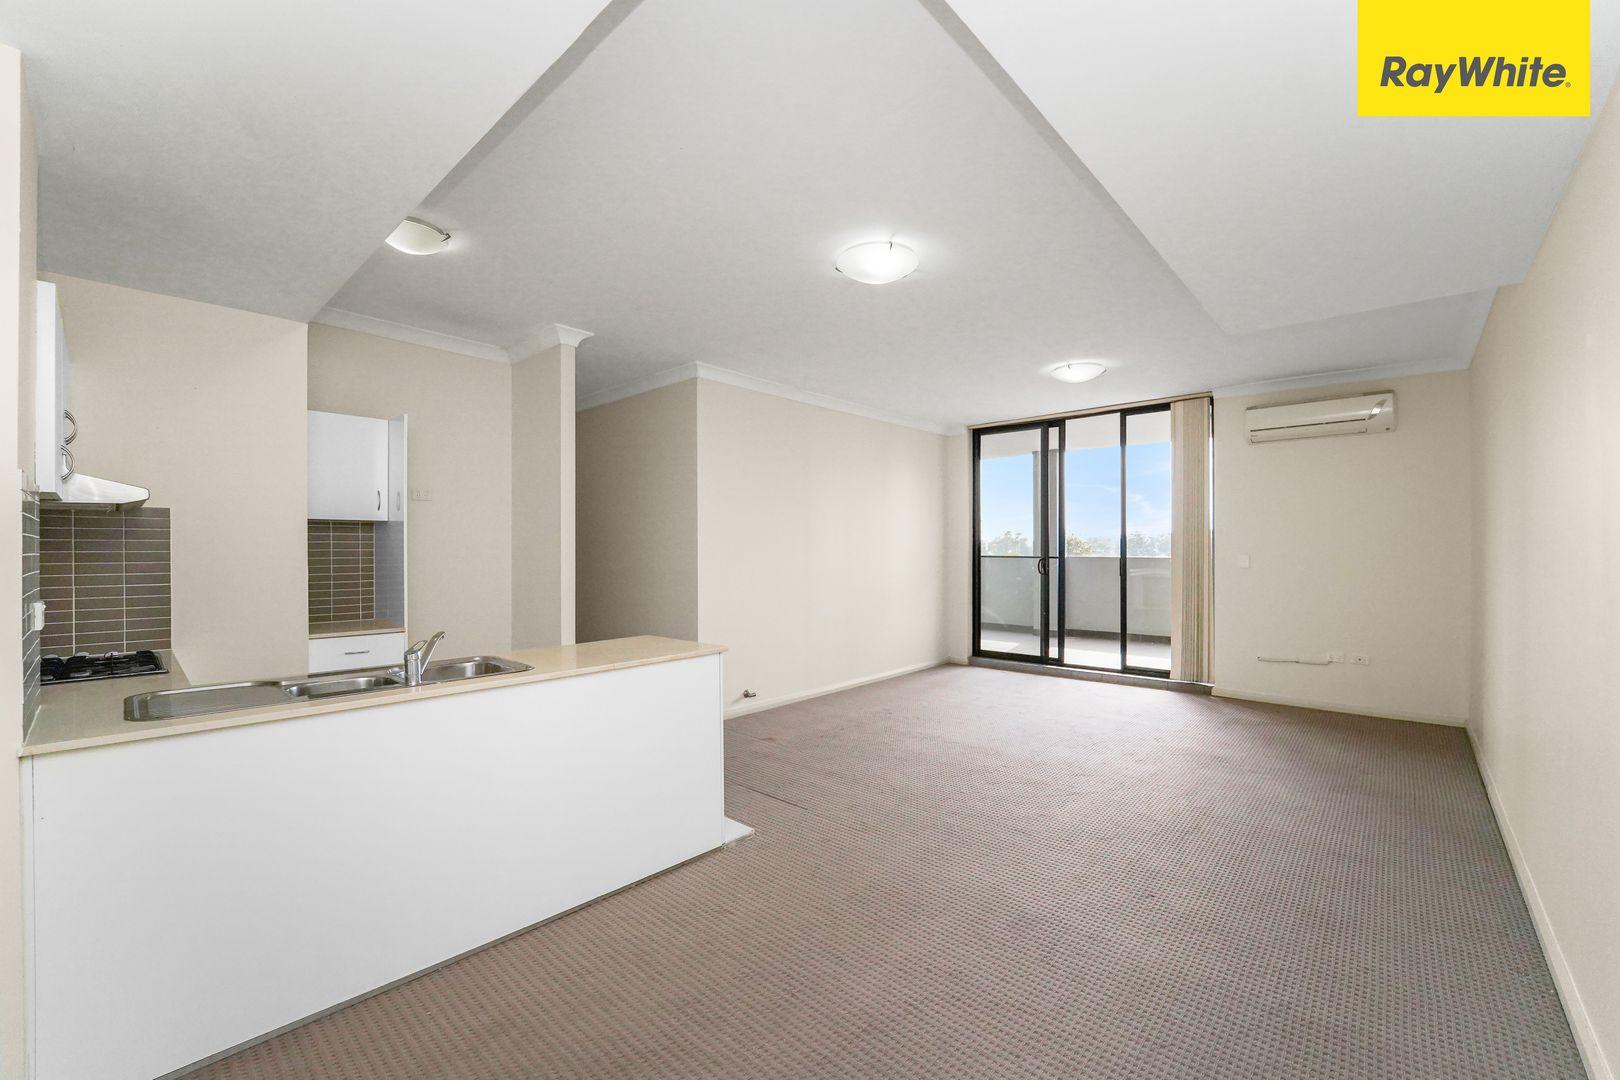 13/254 Beames Avenue, Mount Druitt NSW 2770, Image 0